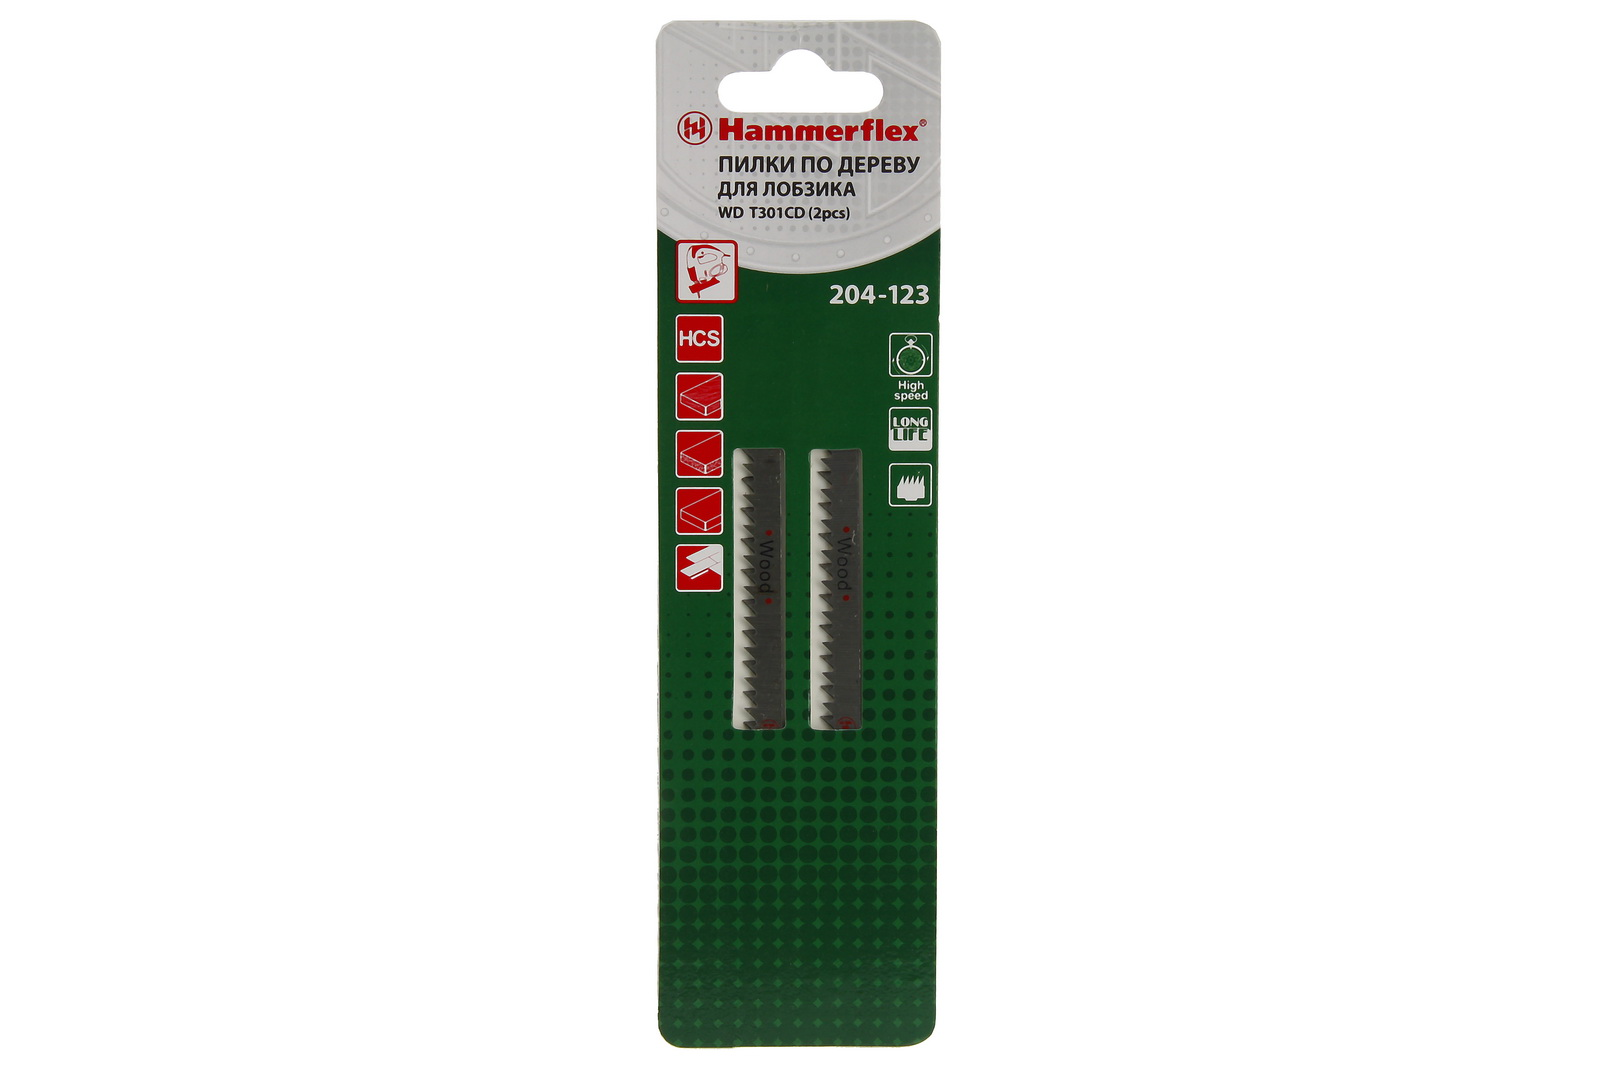 Пилки для лобзика Hammer 204-123 jg wd t301cd (2 шт.) пилки для лобзика hammer 204 123 jg wd t301cd 2 шт